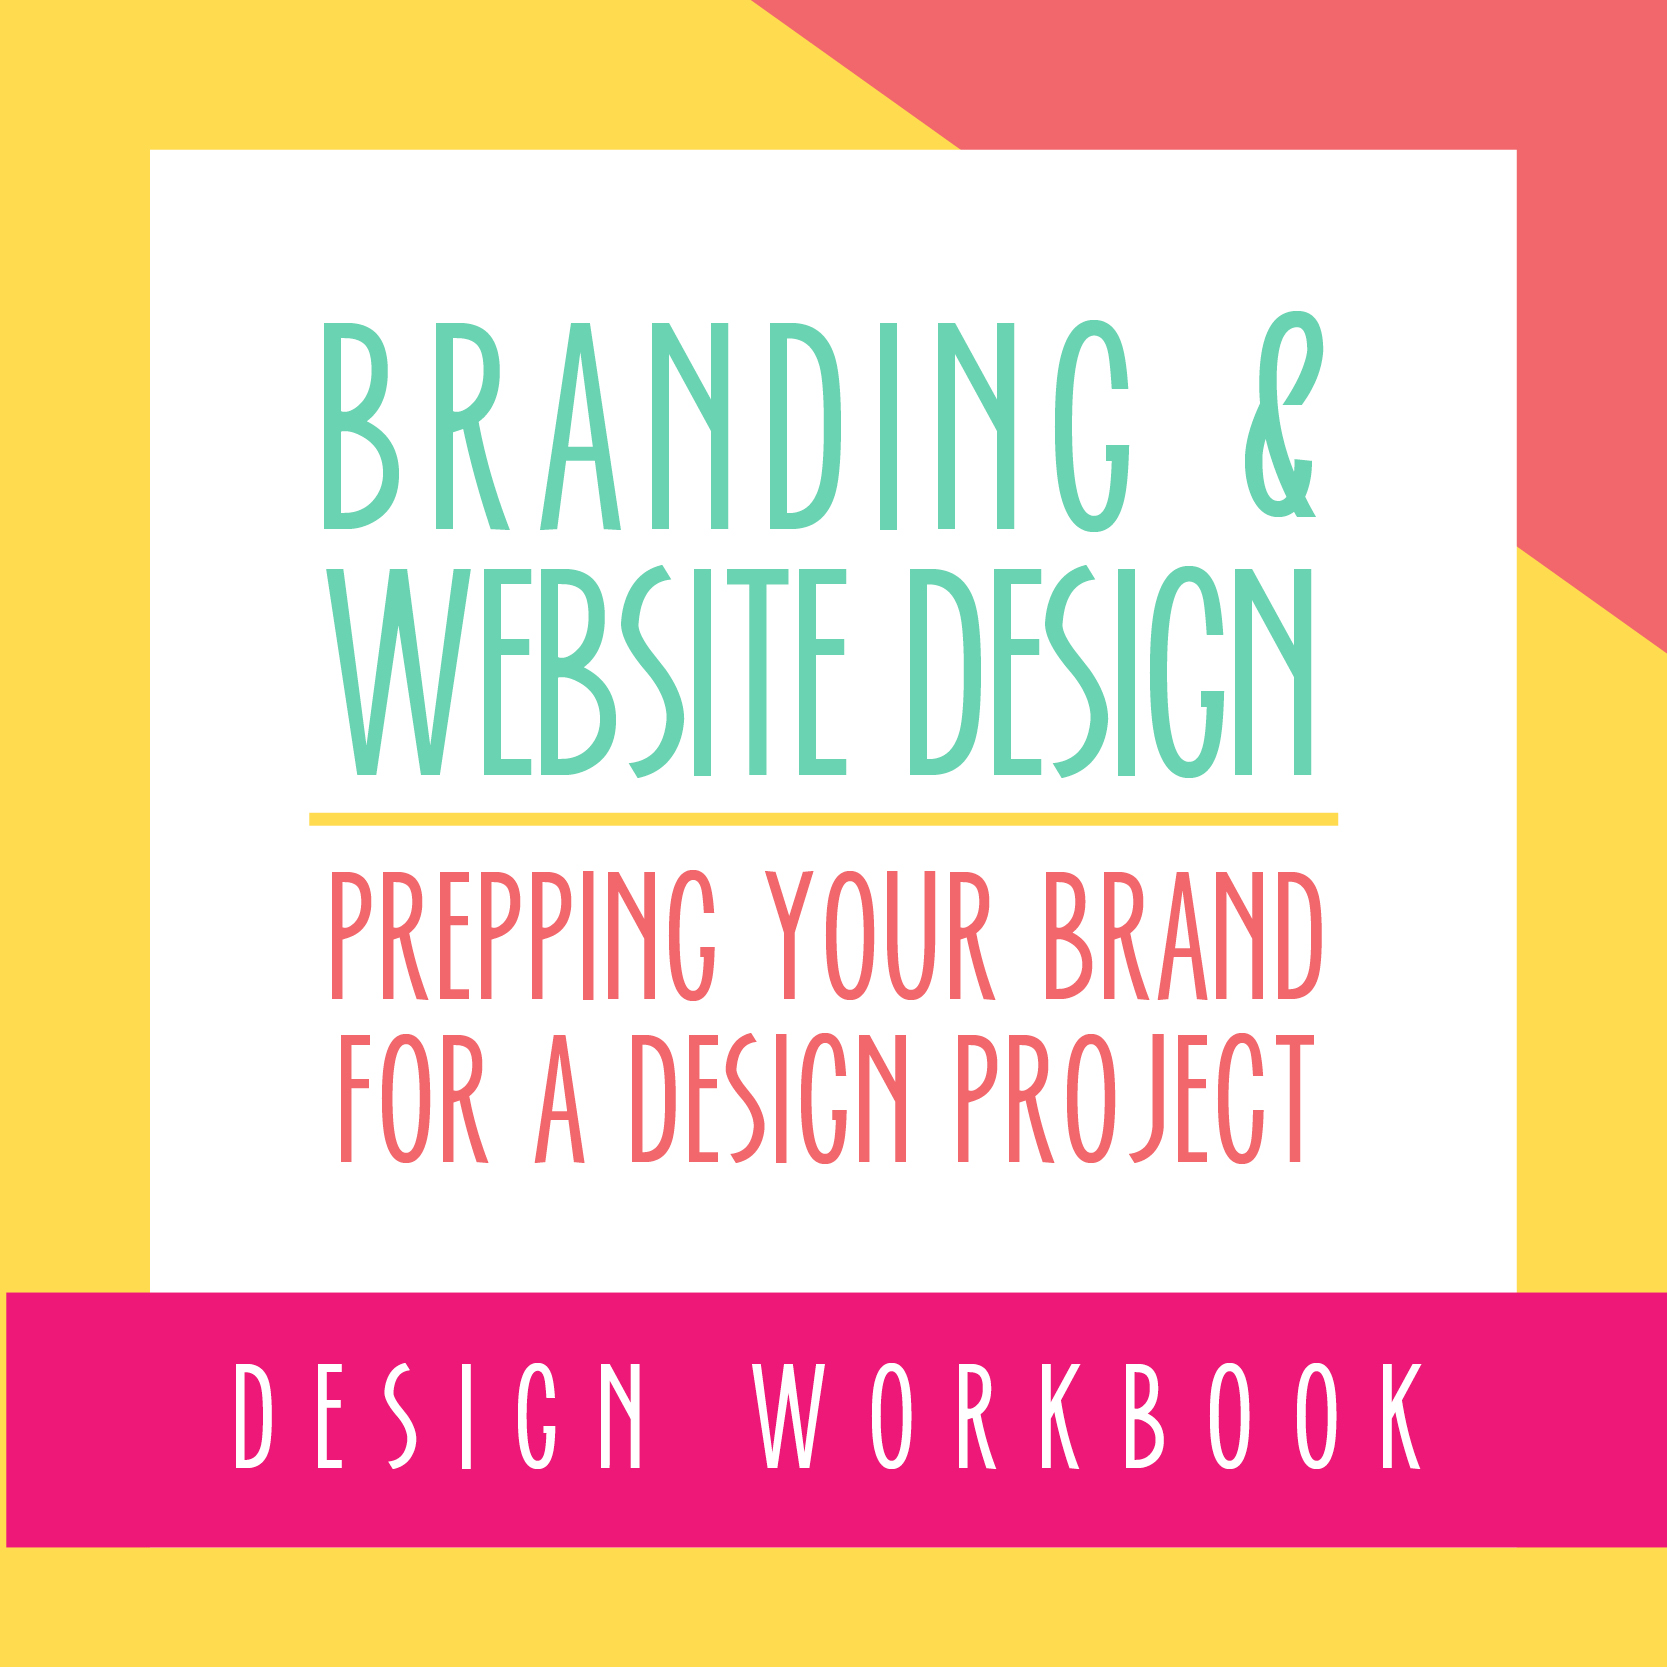 Bold & Pop : Branding, Squarespace website design, and social media collective : Content Upgrades : Instagram